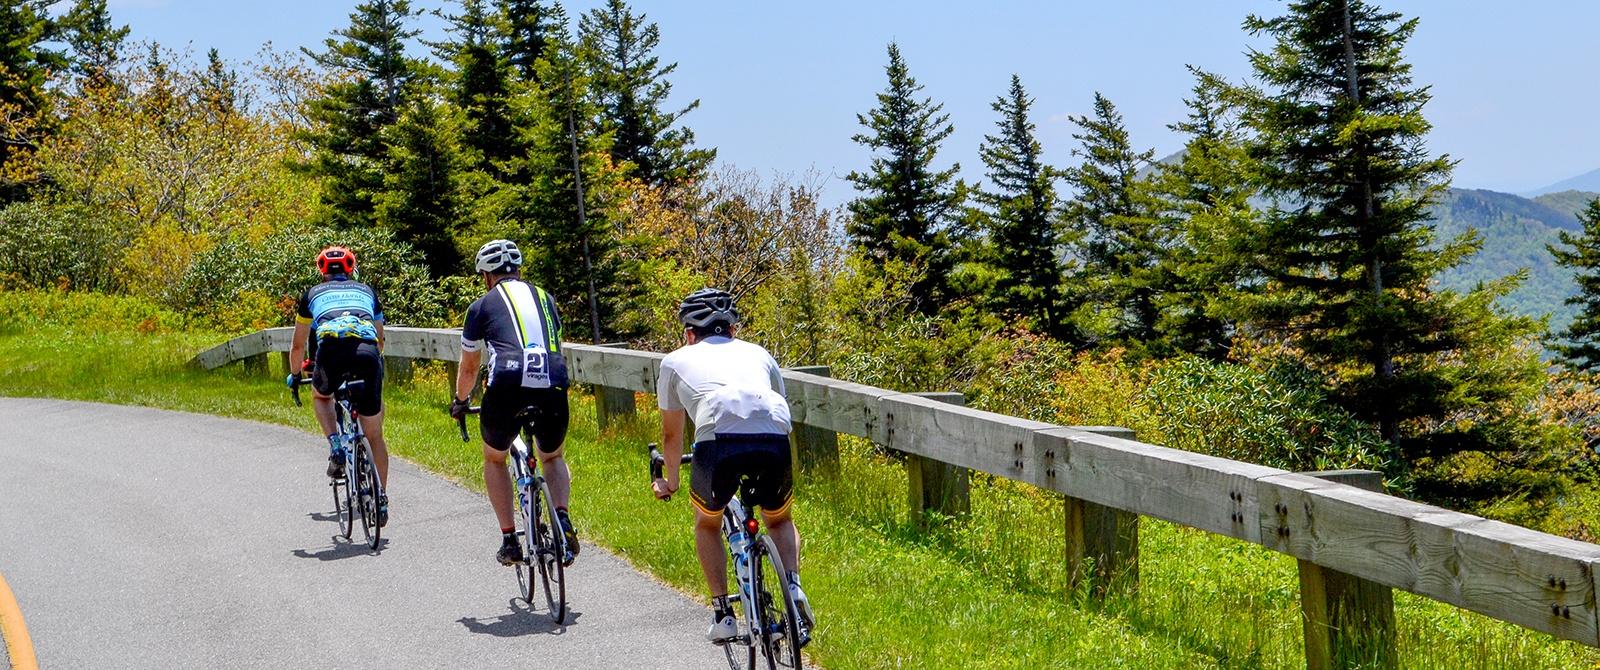 Asheville To Brevard Bike Tours Cycling Vacations Garmin 8000 Wiring Diagram Istock 000022806875 Xxxlarge 1600x670 Dsc 2631 Jbinkowski 2636